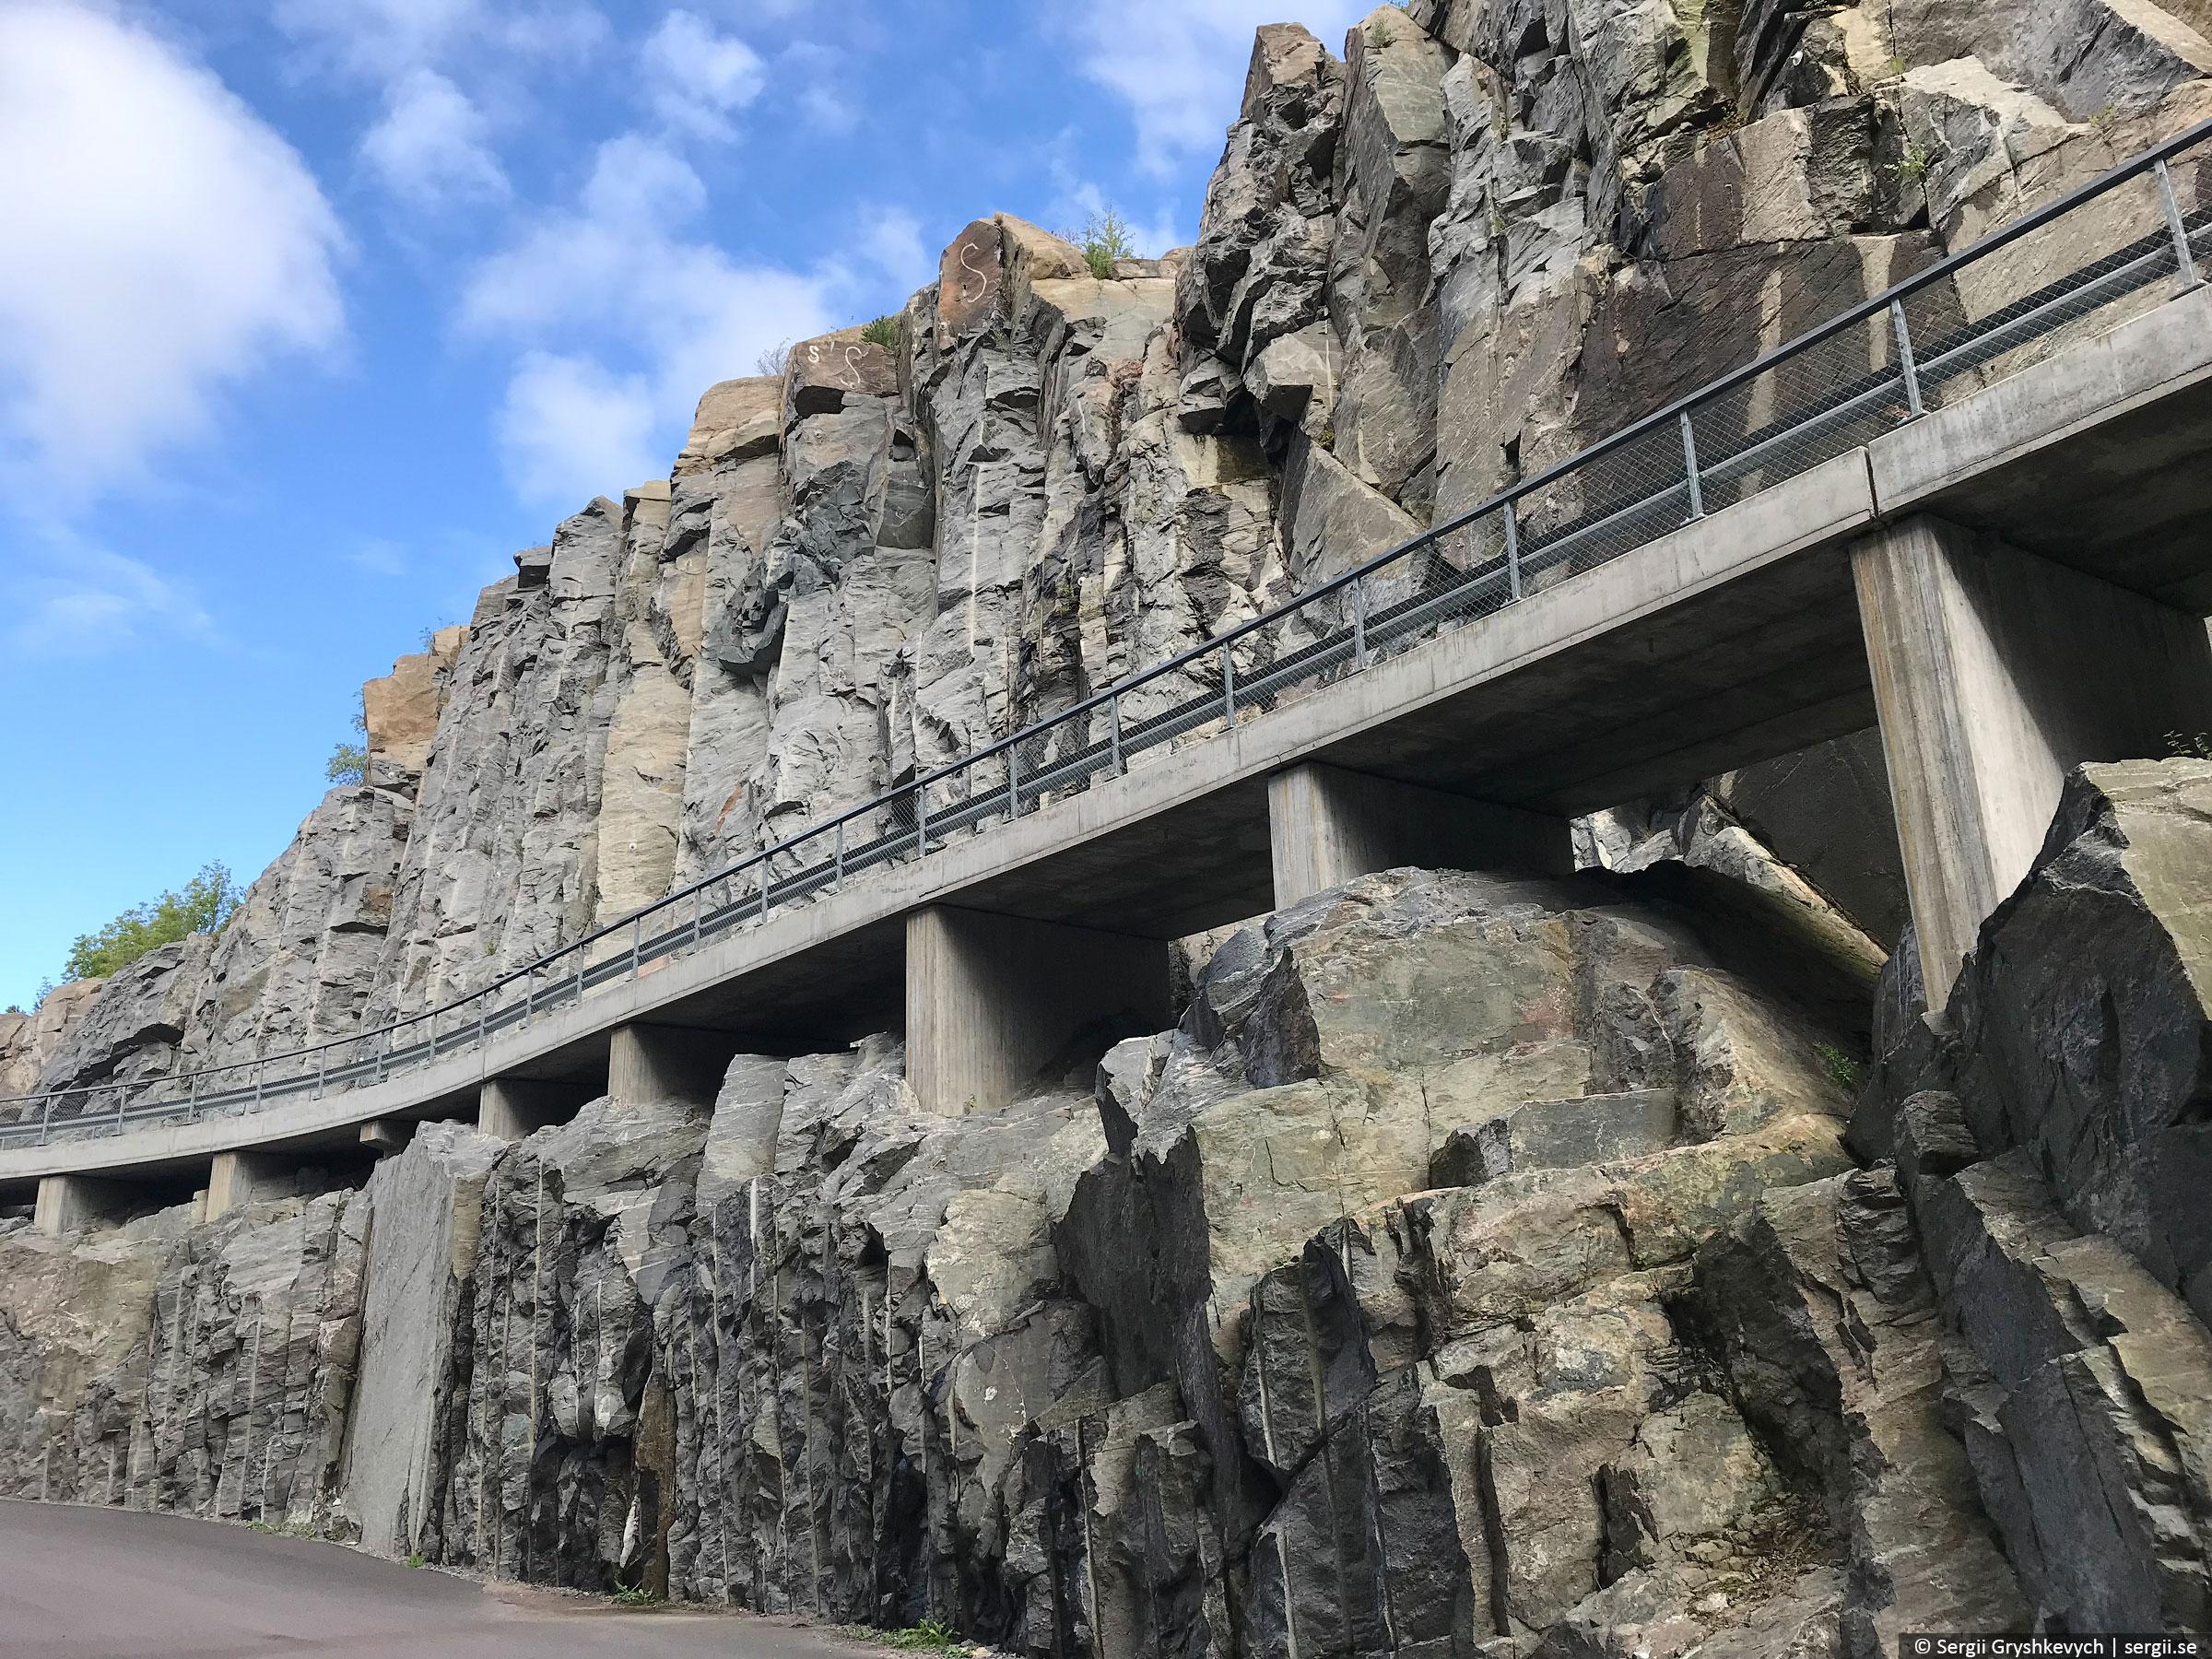 göteborg-ghotenburg-sweden-2018-2